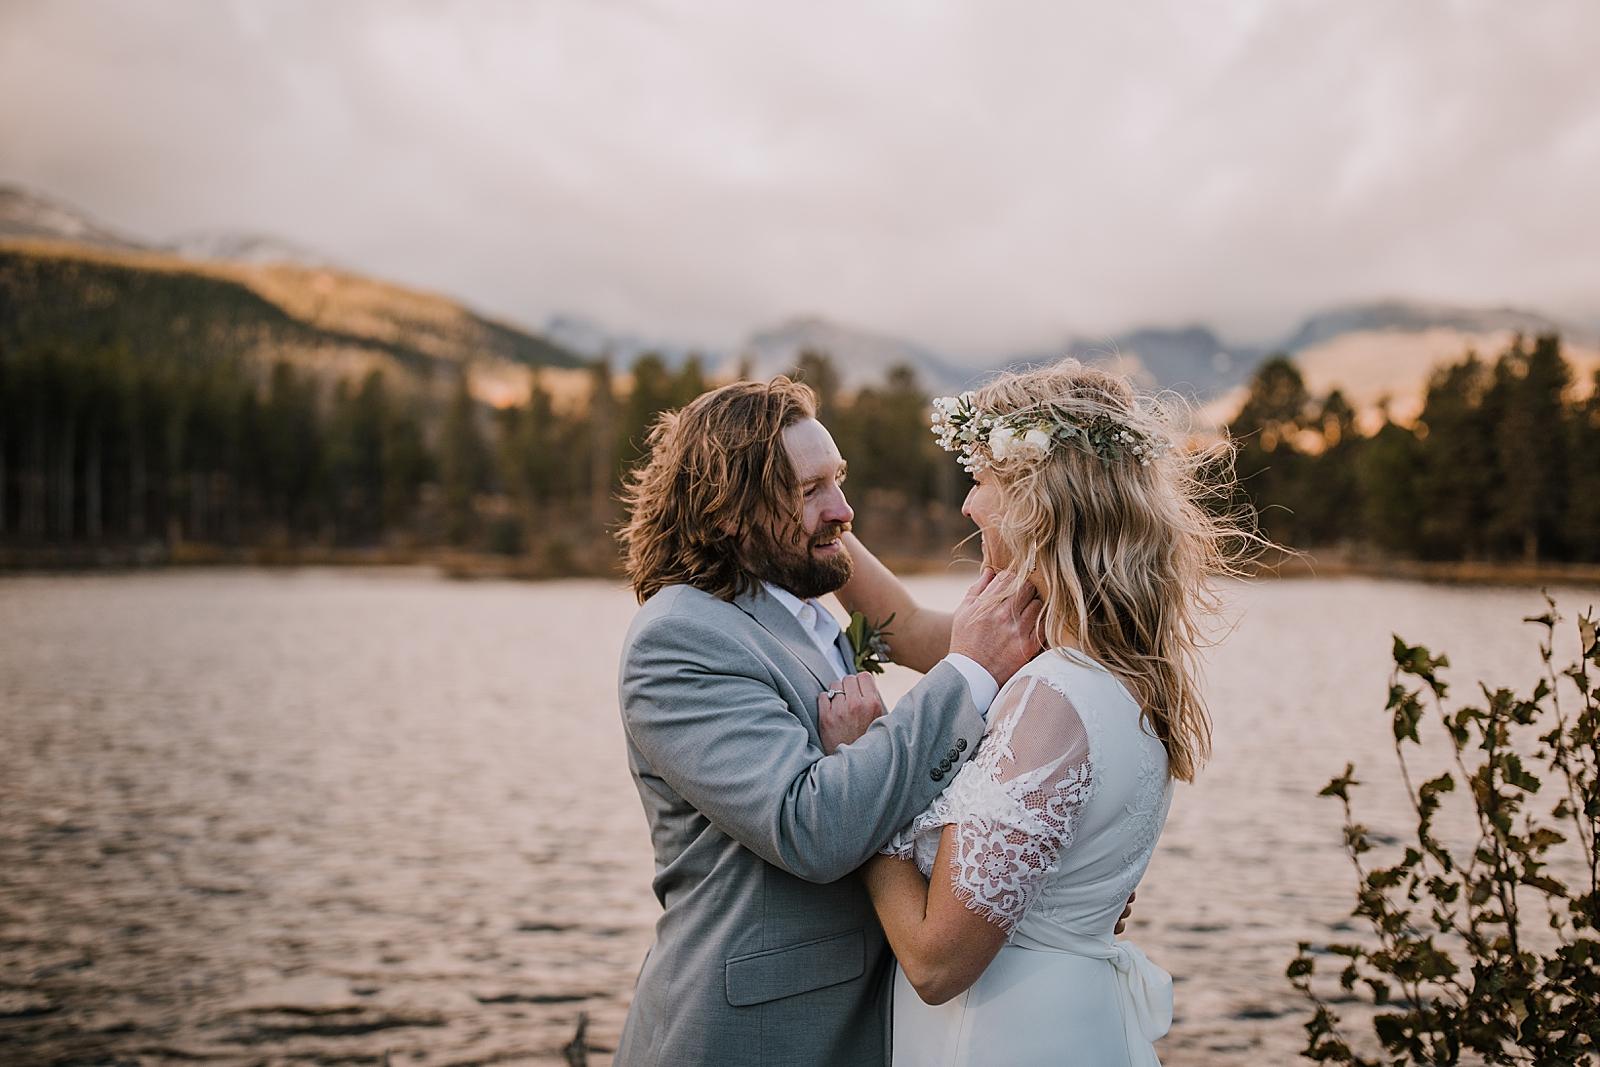 hiking bride and groom, sprague lake dock elopement, sunrise elopement, colorado elopement, sprague lake elopement, rocky mountain national park elopement, adventurous colorado hiking elopement